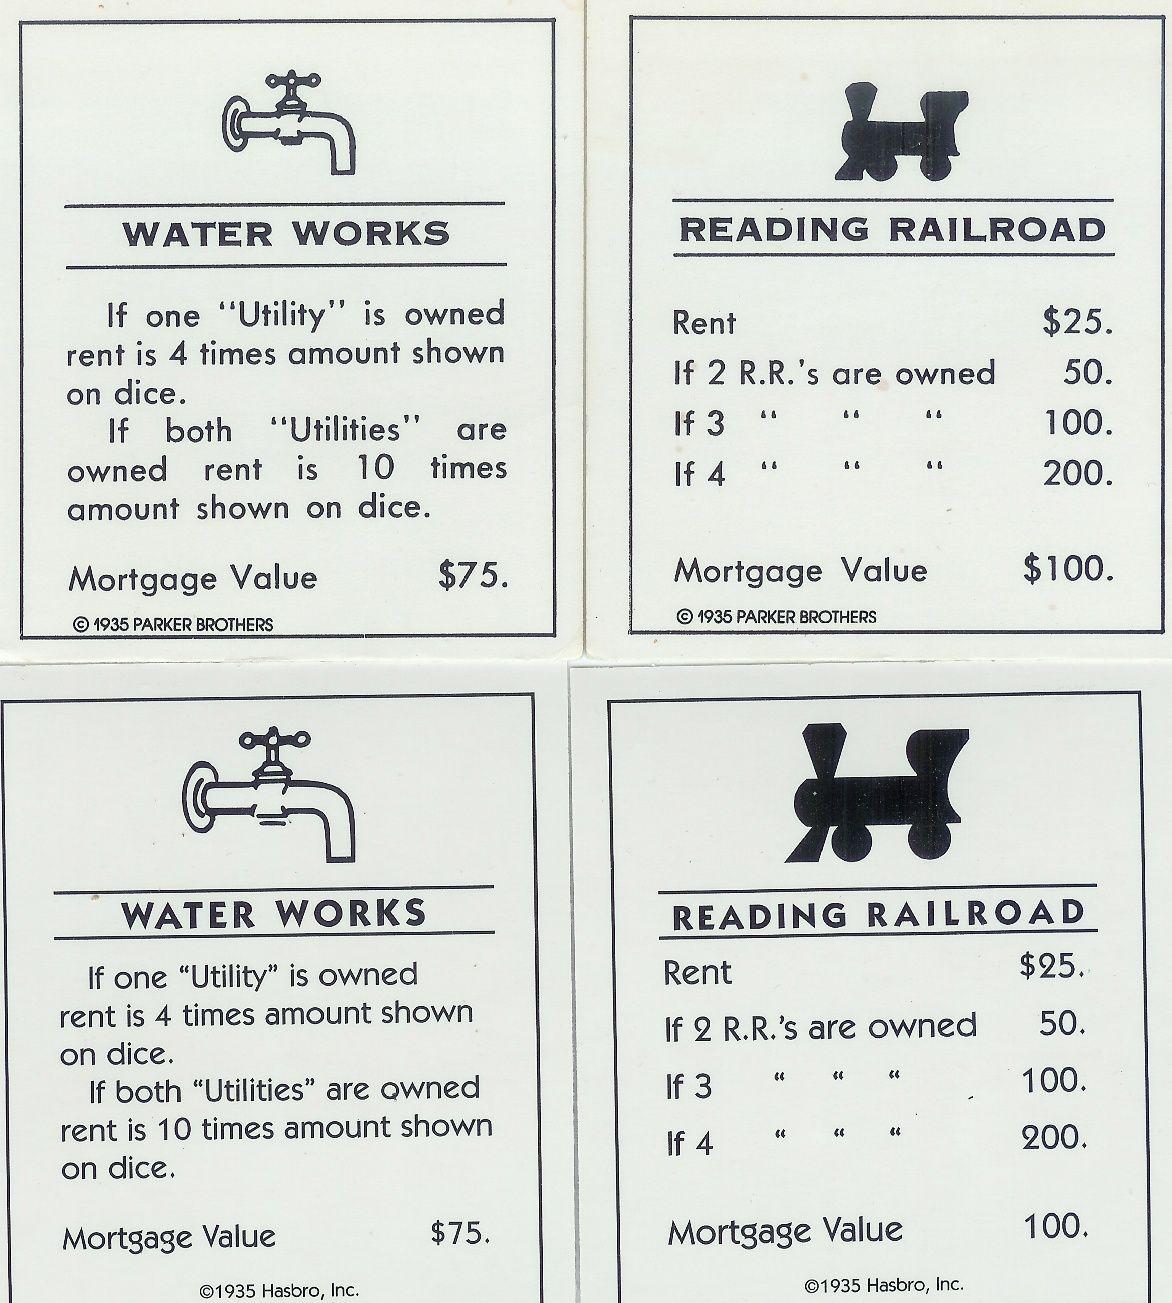 Original Monopoly Property Cards Printable Monopoly Cards With Get Out Of Jail Free Card Template Best Tem Juegos De Monopoly Tarjetas Plantilla De Tarjeta